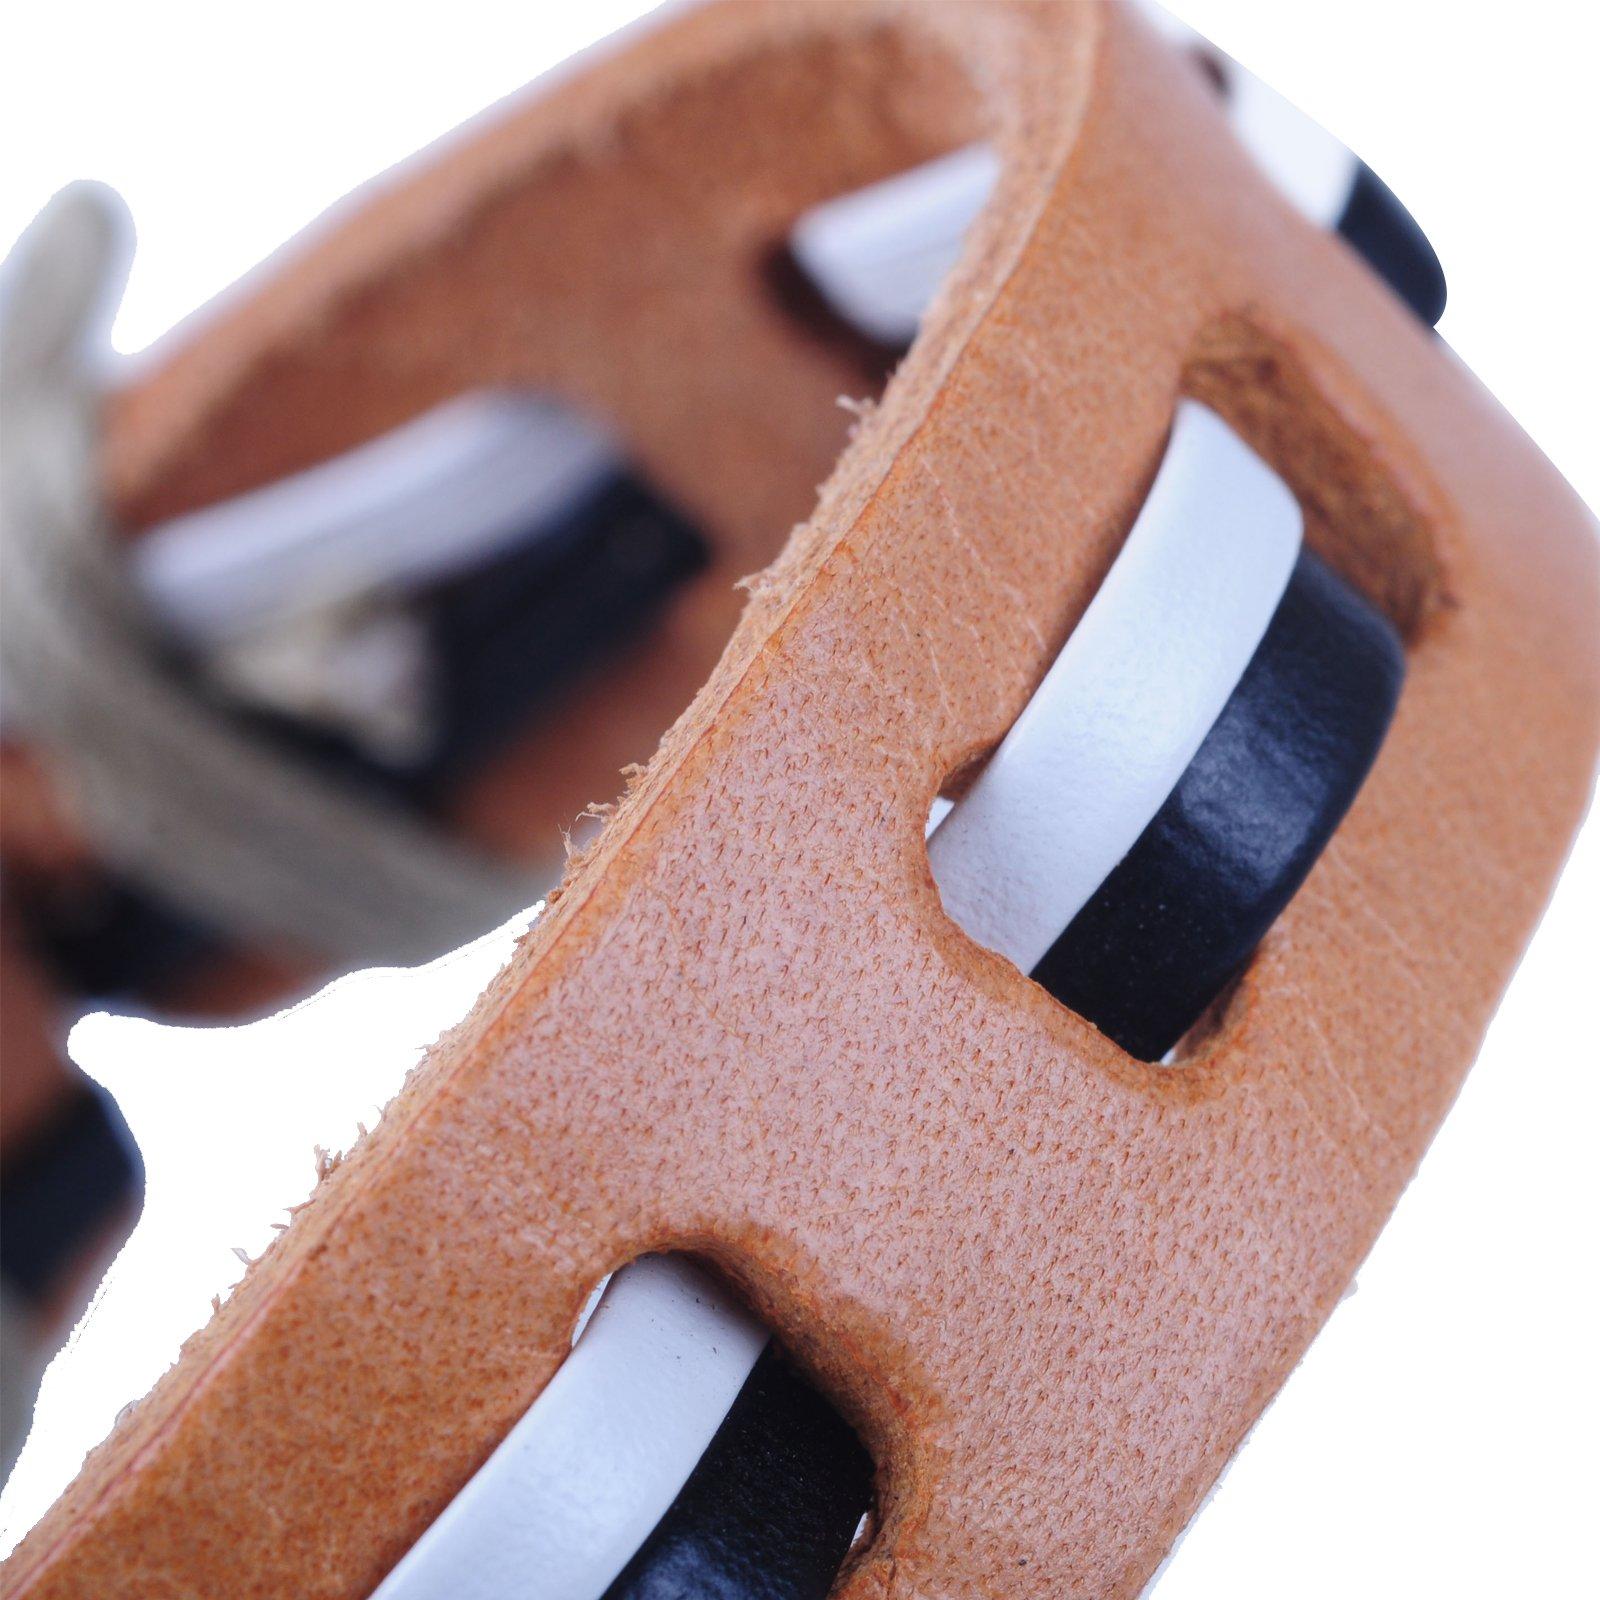 New-Fawn-Orange-Brown-Unisex-Genuine-Leather-Adjustable-Bracelets-Gift-086USANNA miniature 17